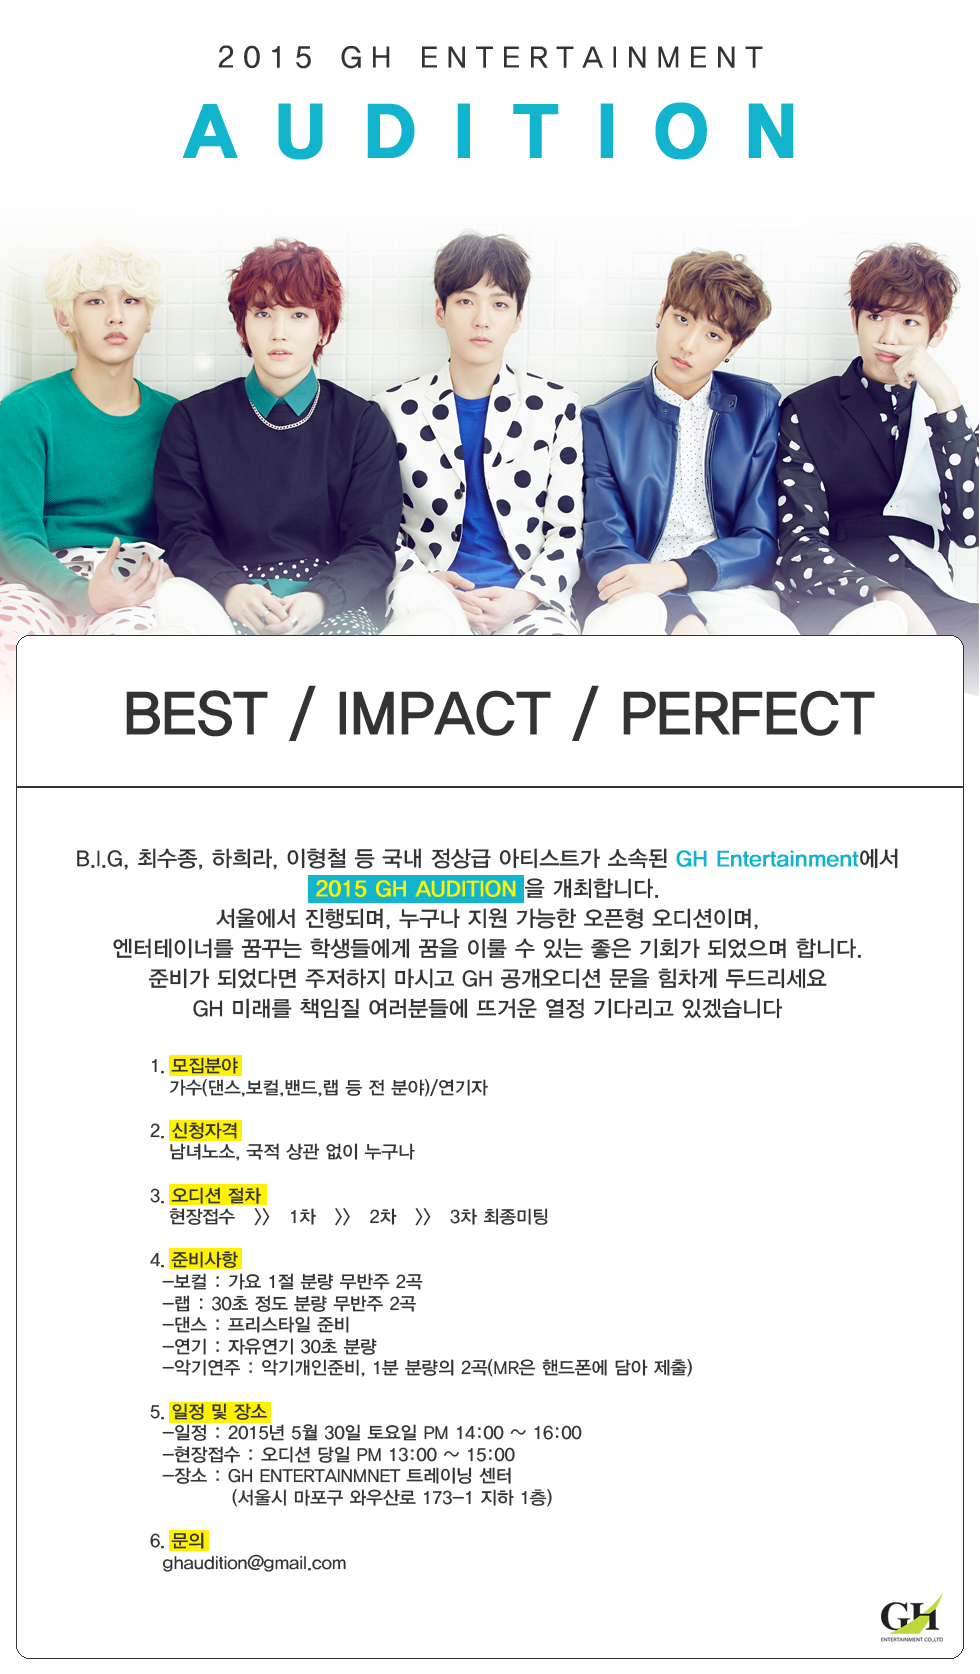 GH엔터테인먼트 5월 공개오디션 개최.png